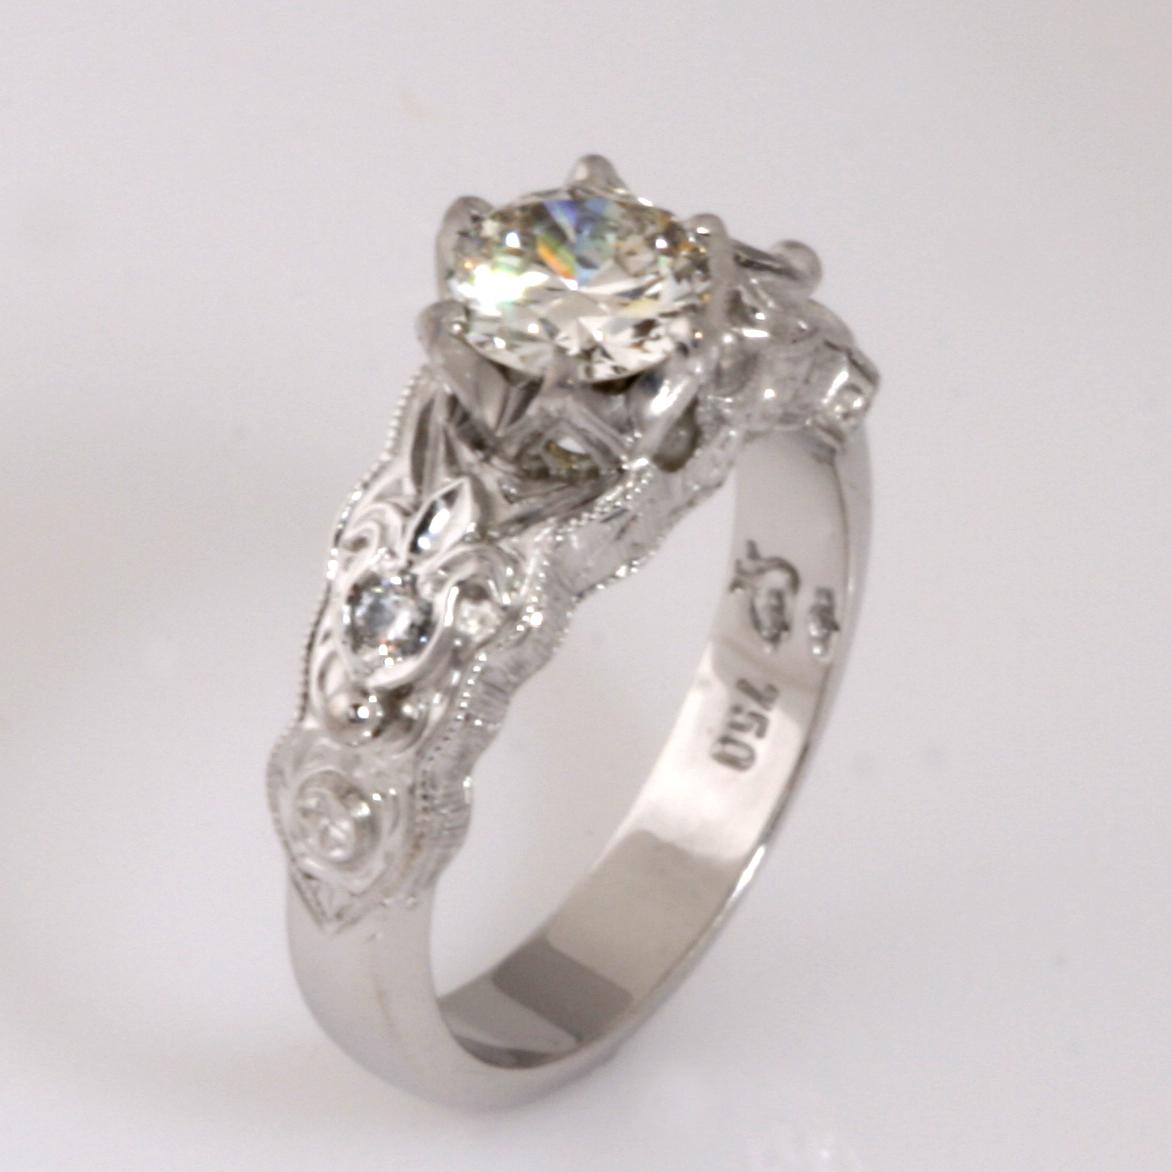 Handmade ladies 18ct white gold old cut diamond ring